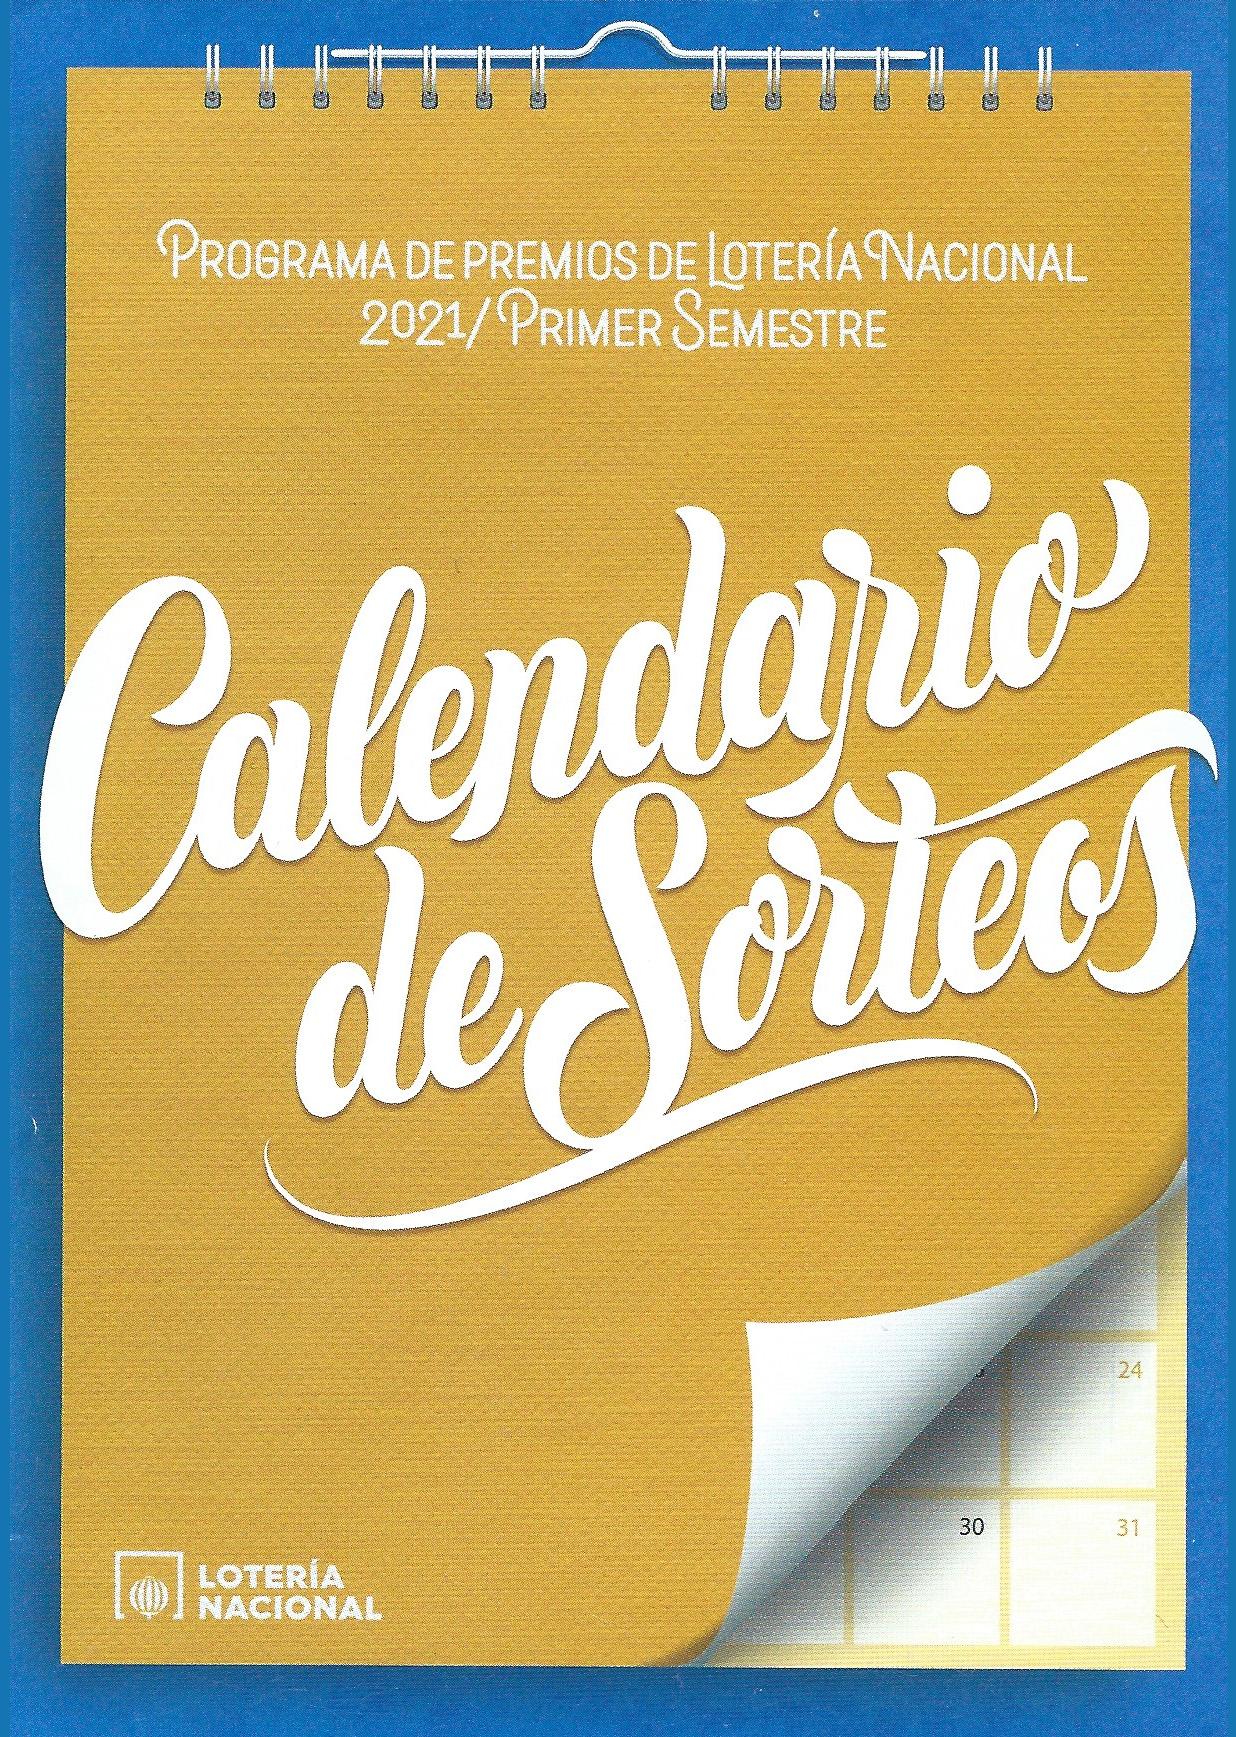 Calendario 2021 1er Semestre Loteria Nacional